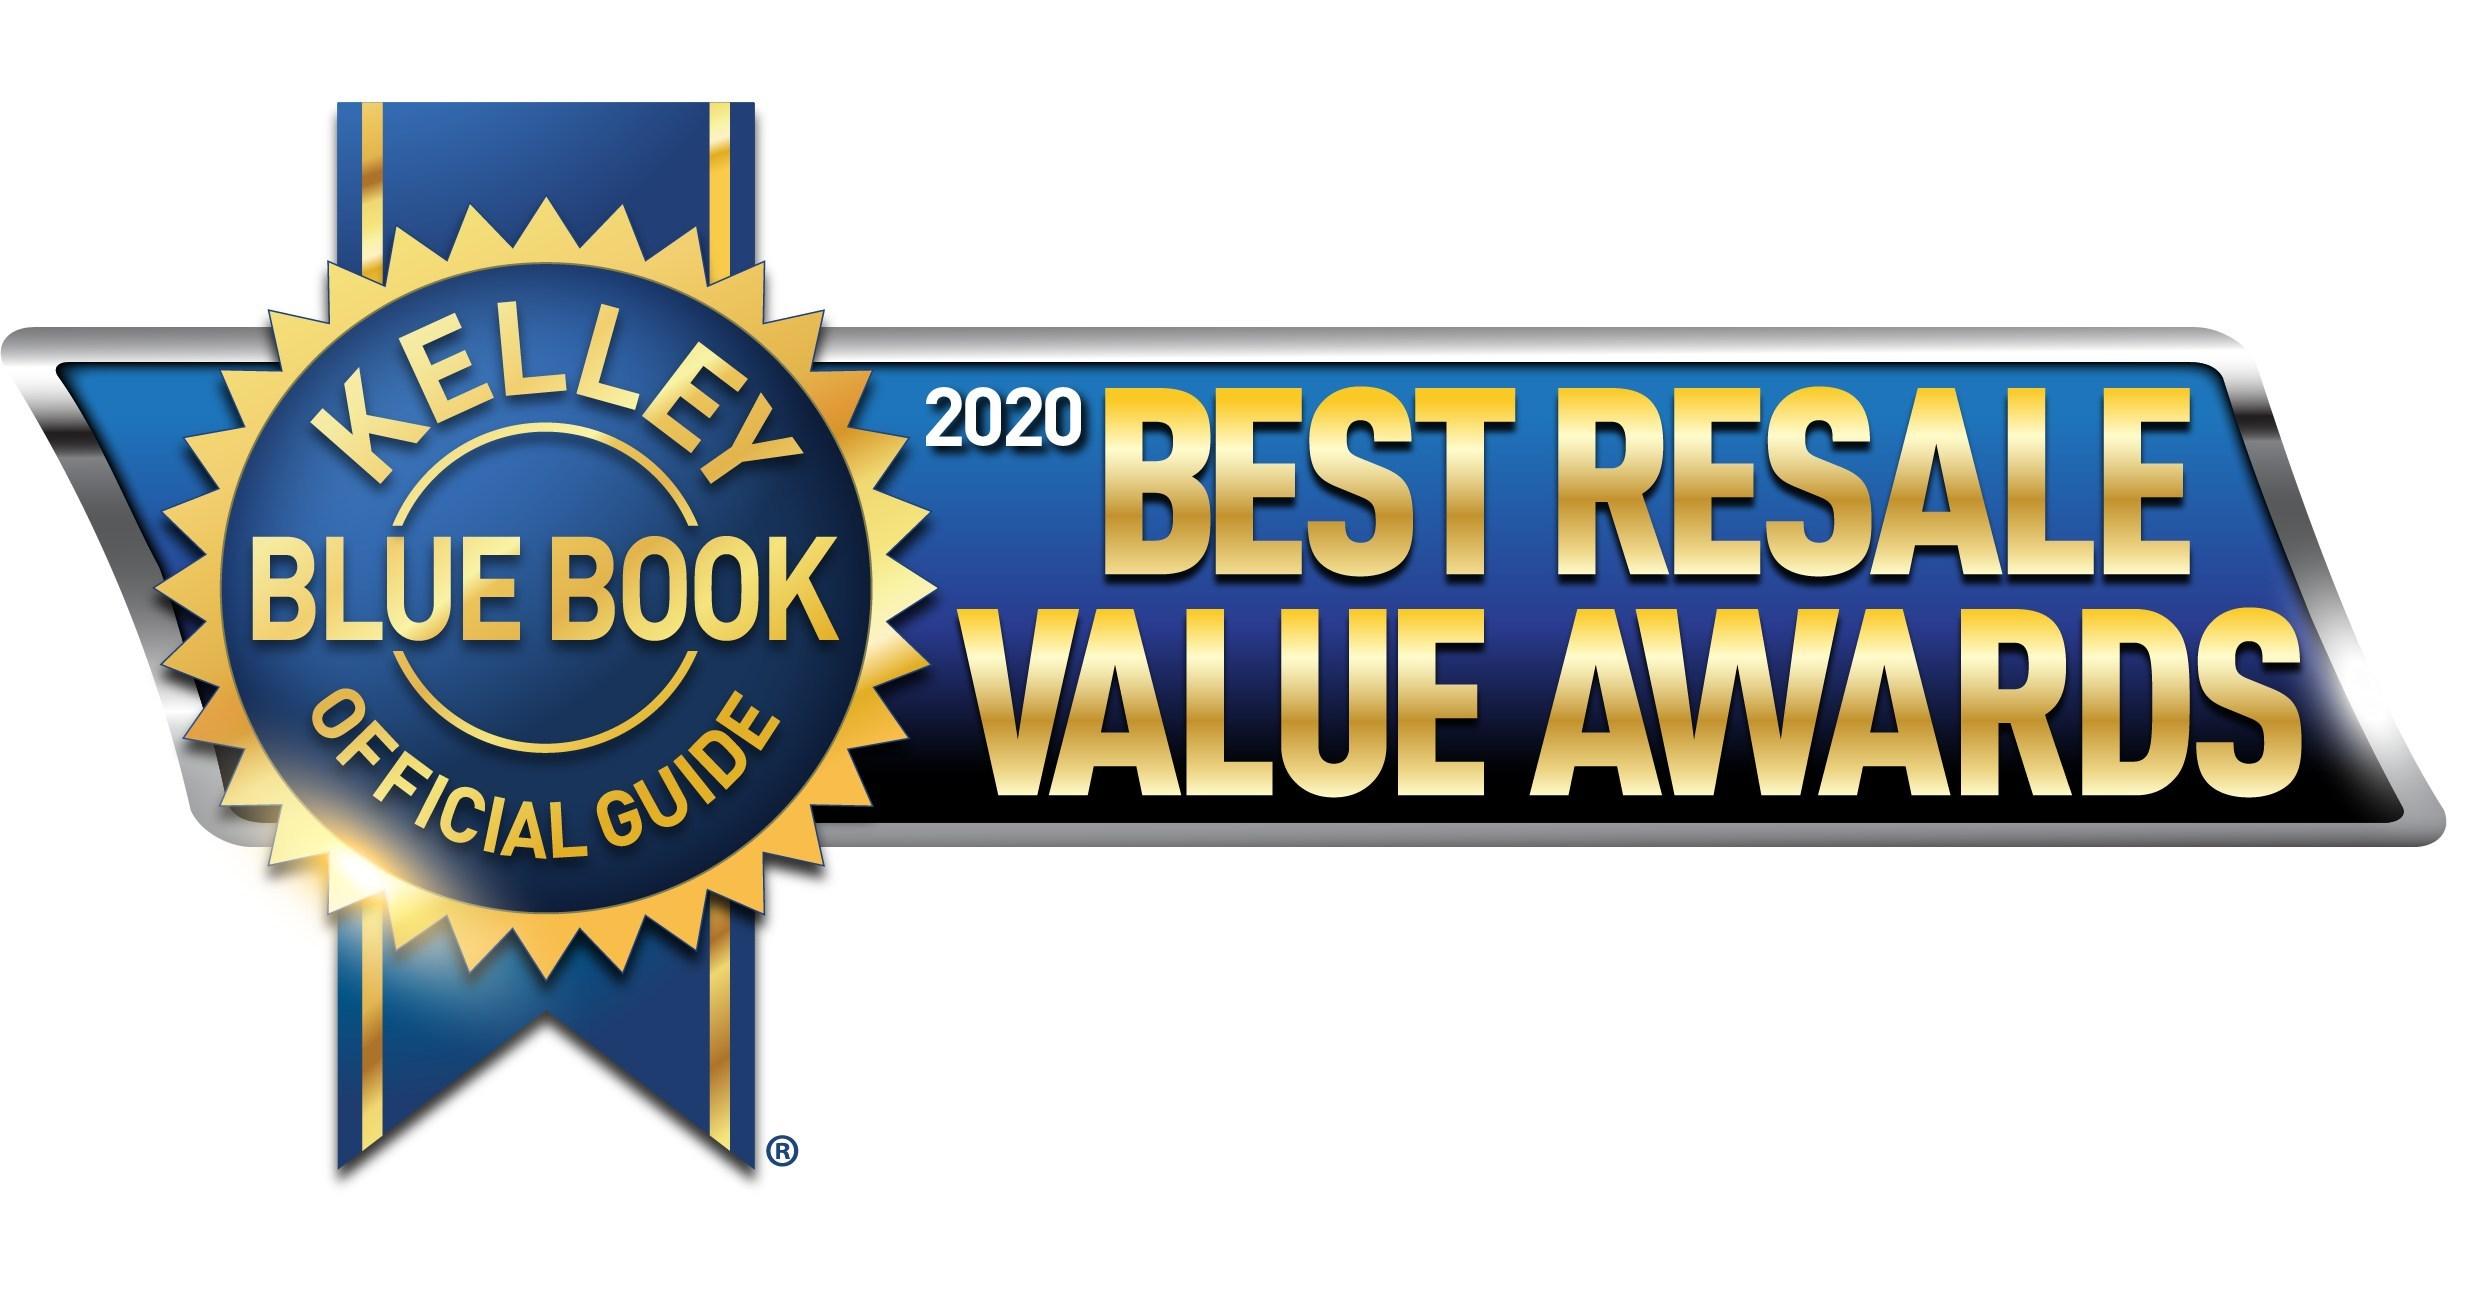 Kelley Blue Book Names 2020 Best Resale Value Award Winners Jan 21 2020